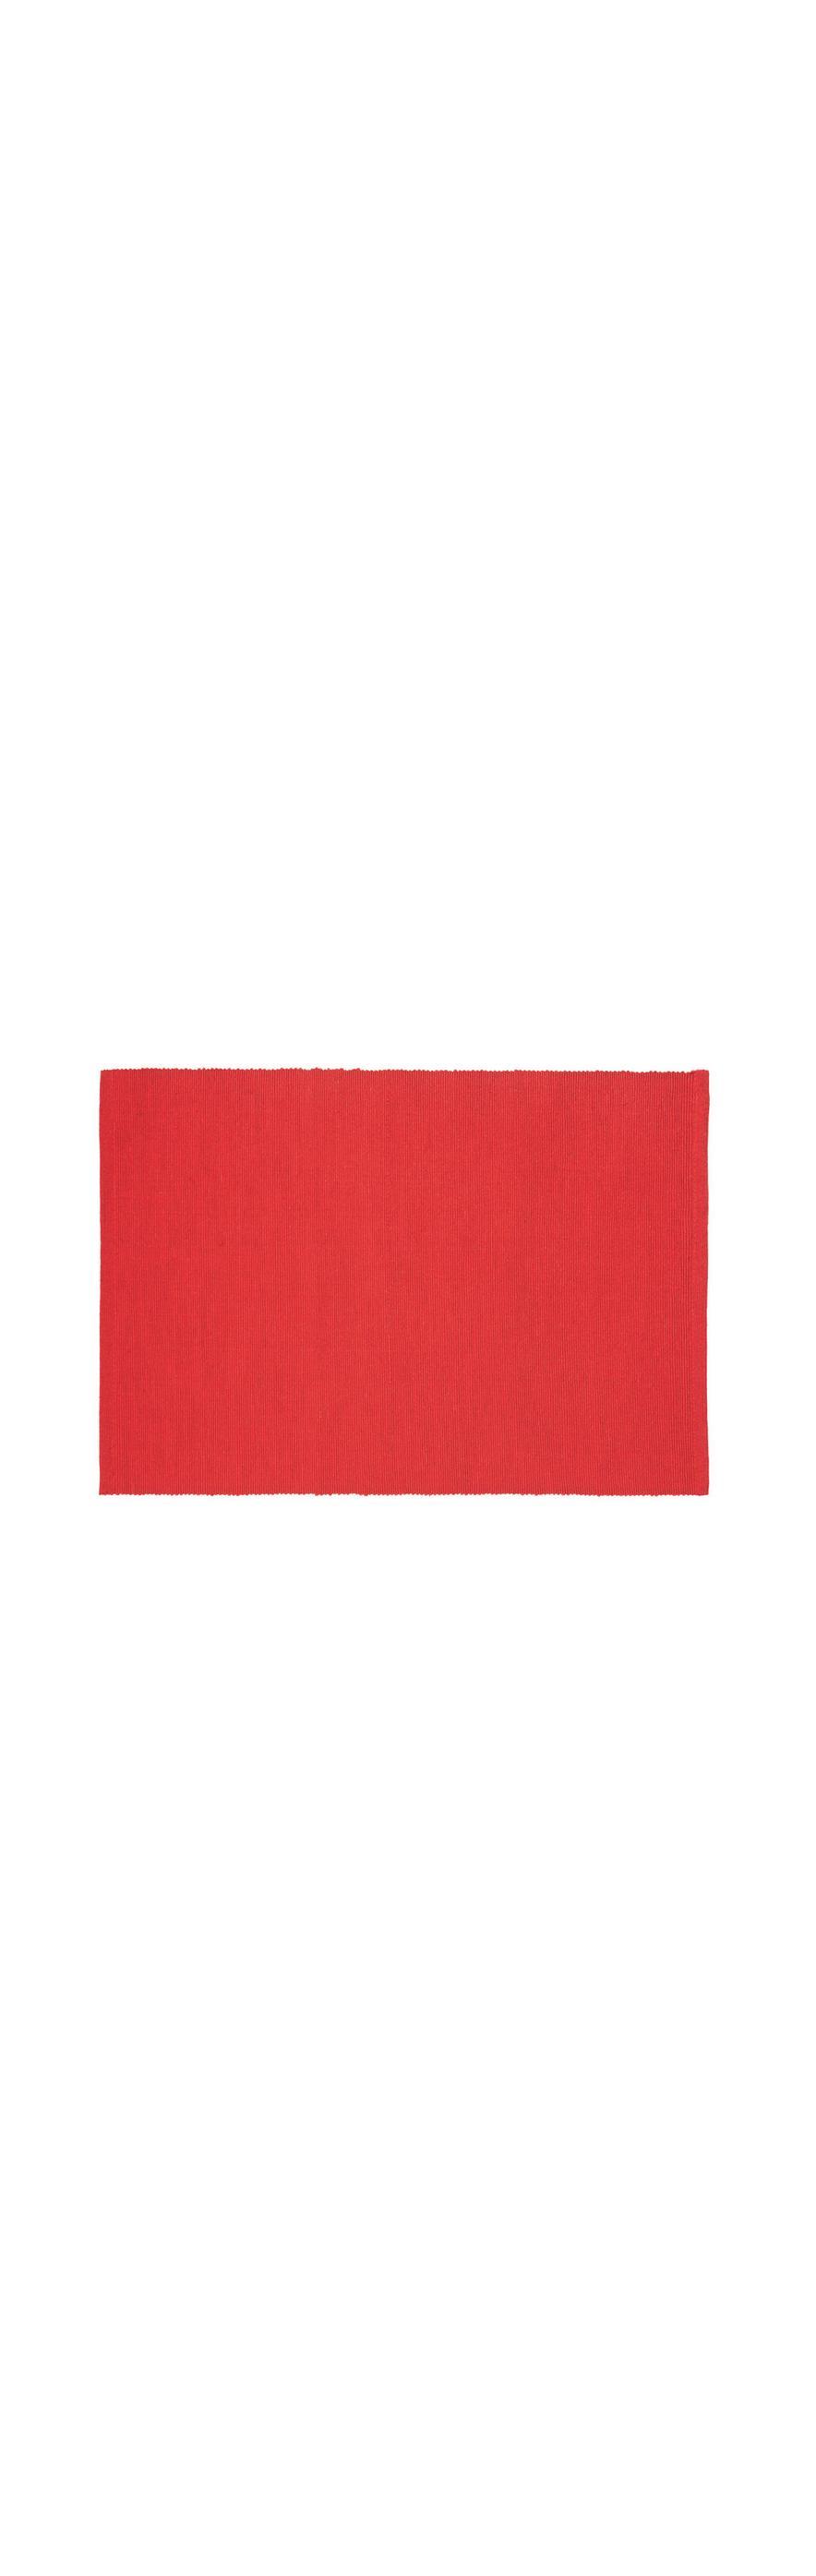 Tischset Maren Rot Online Kaufen Momax